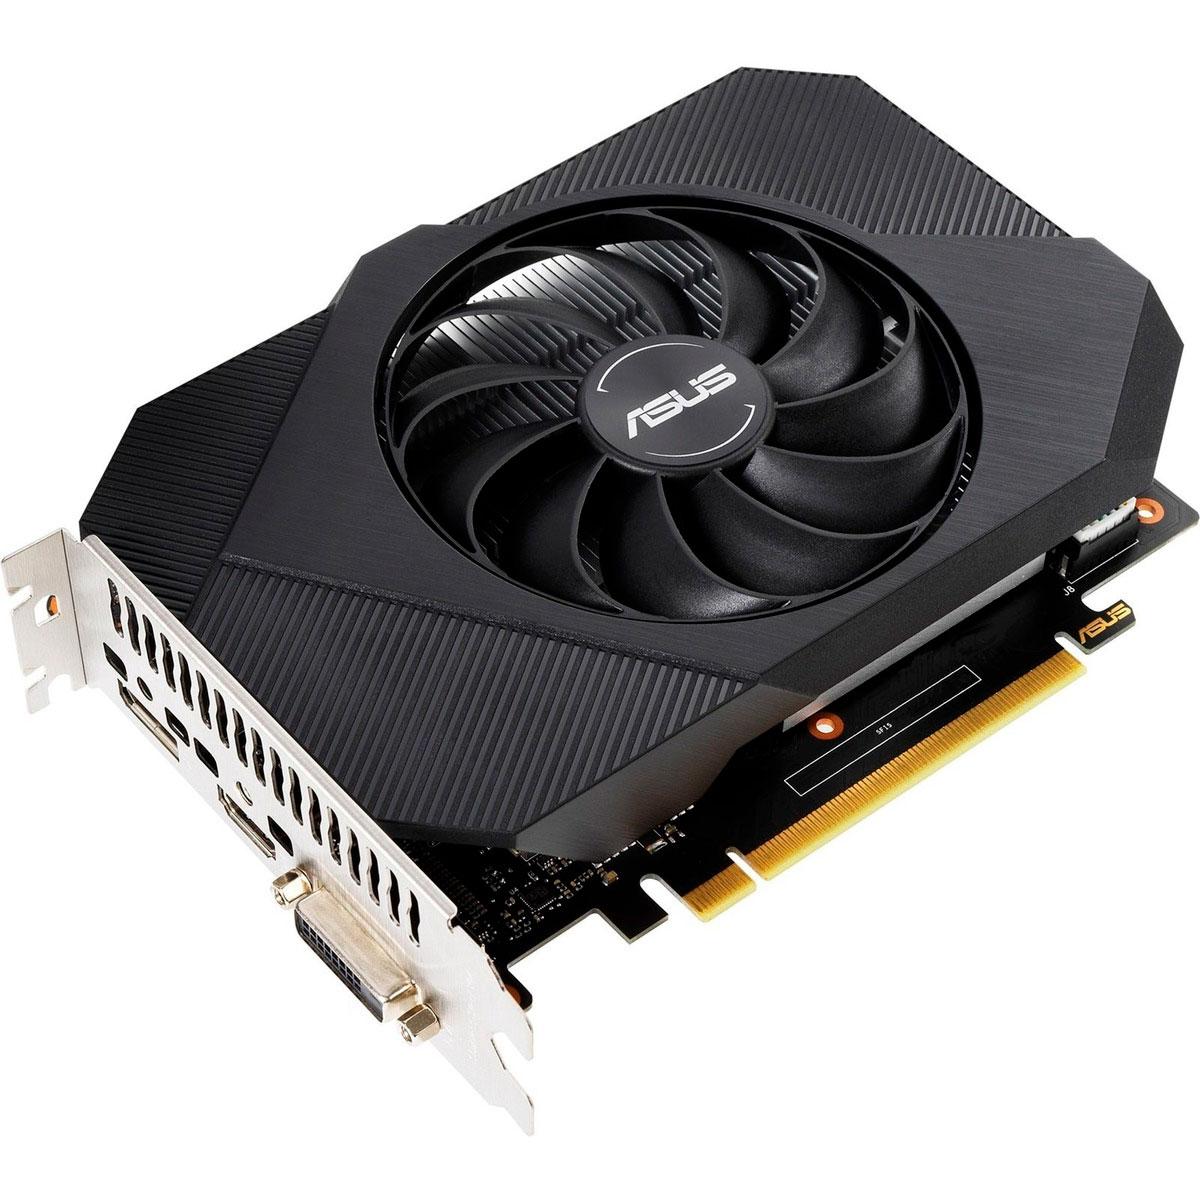 Placa de Vídeo Asus GeForce GTX 1650 OC Edition Phoenix GDDR6 4GB 128 Bits - PH-GTX1650-O4GD6